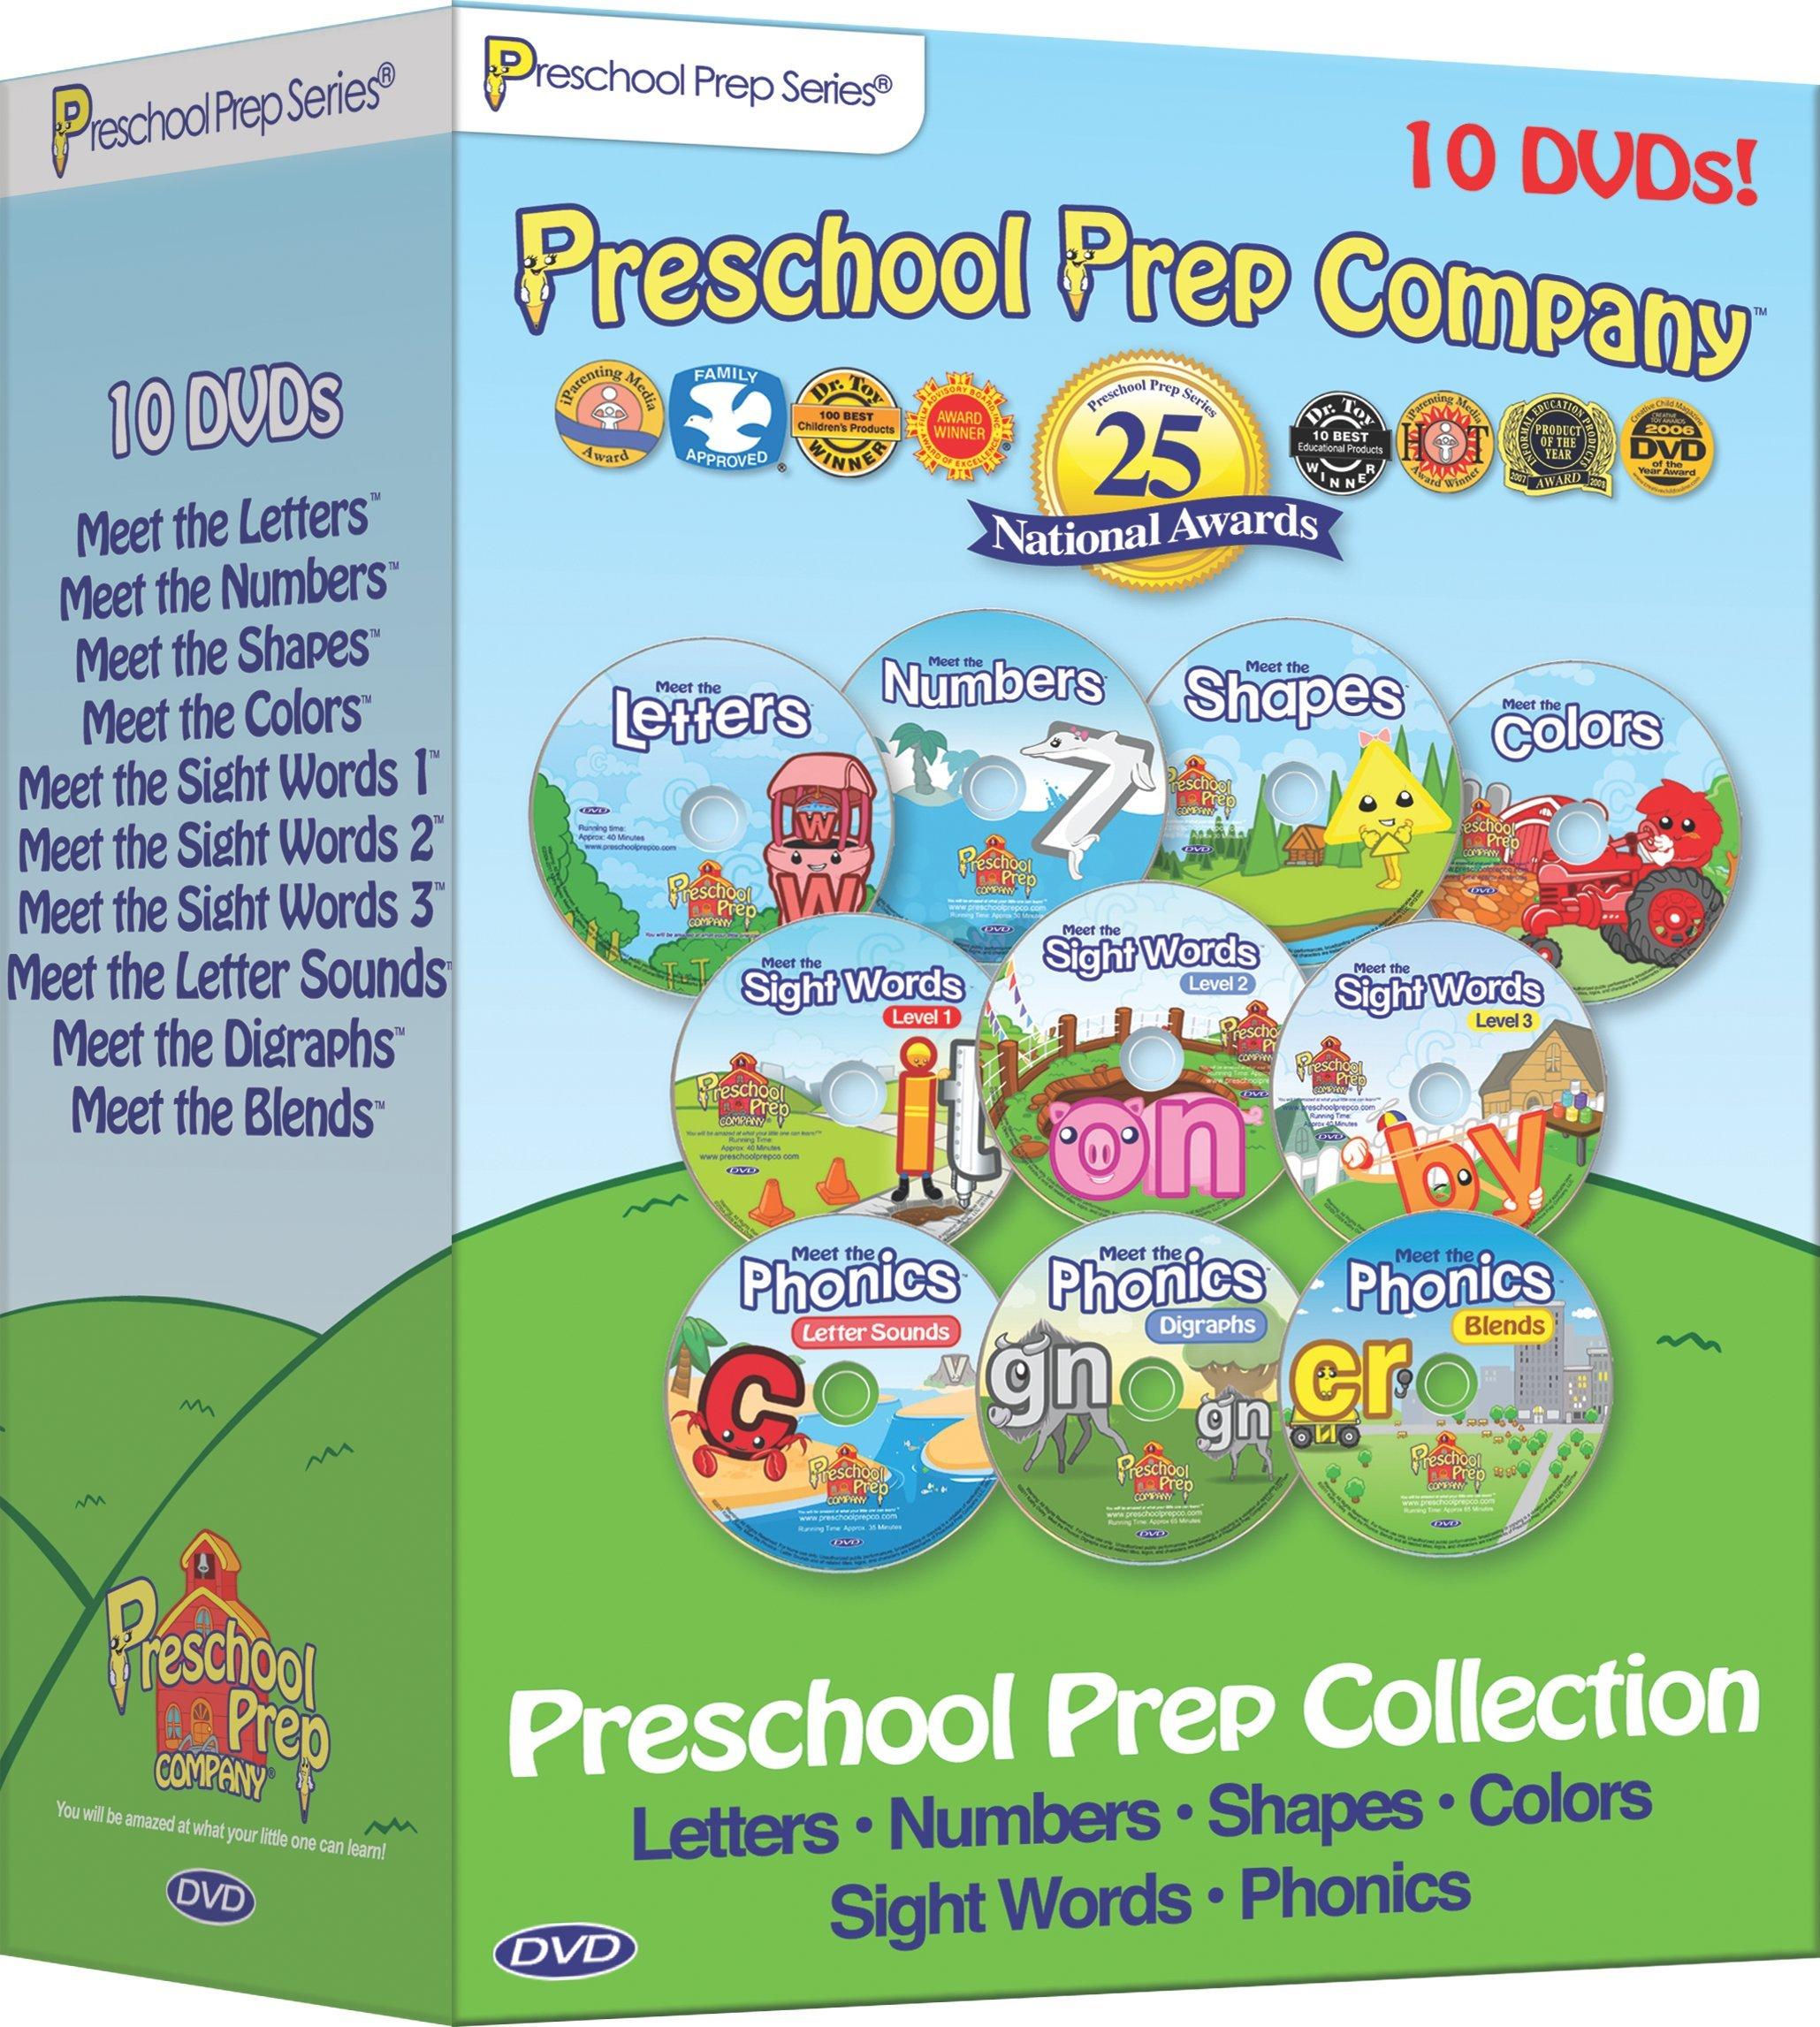 Preschool Prep Series Collection - 10 DVD Boxed Set (Meet the ...